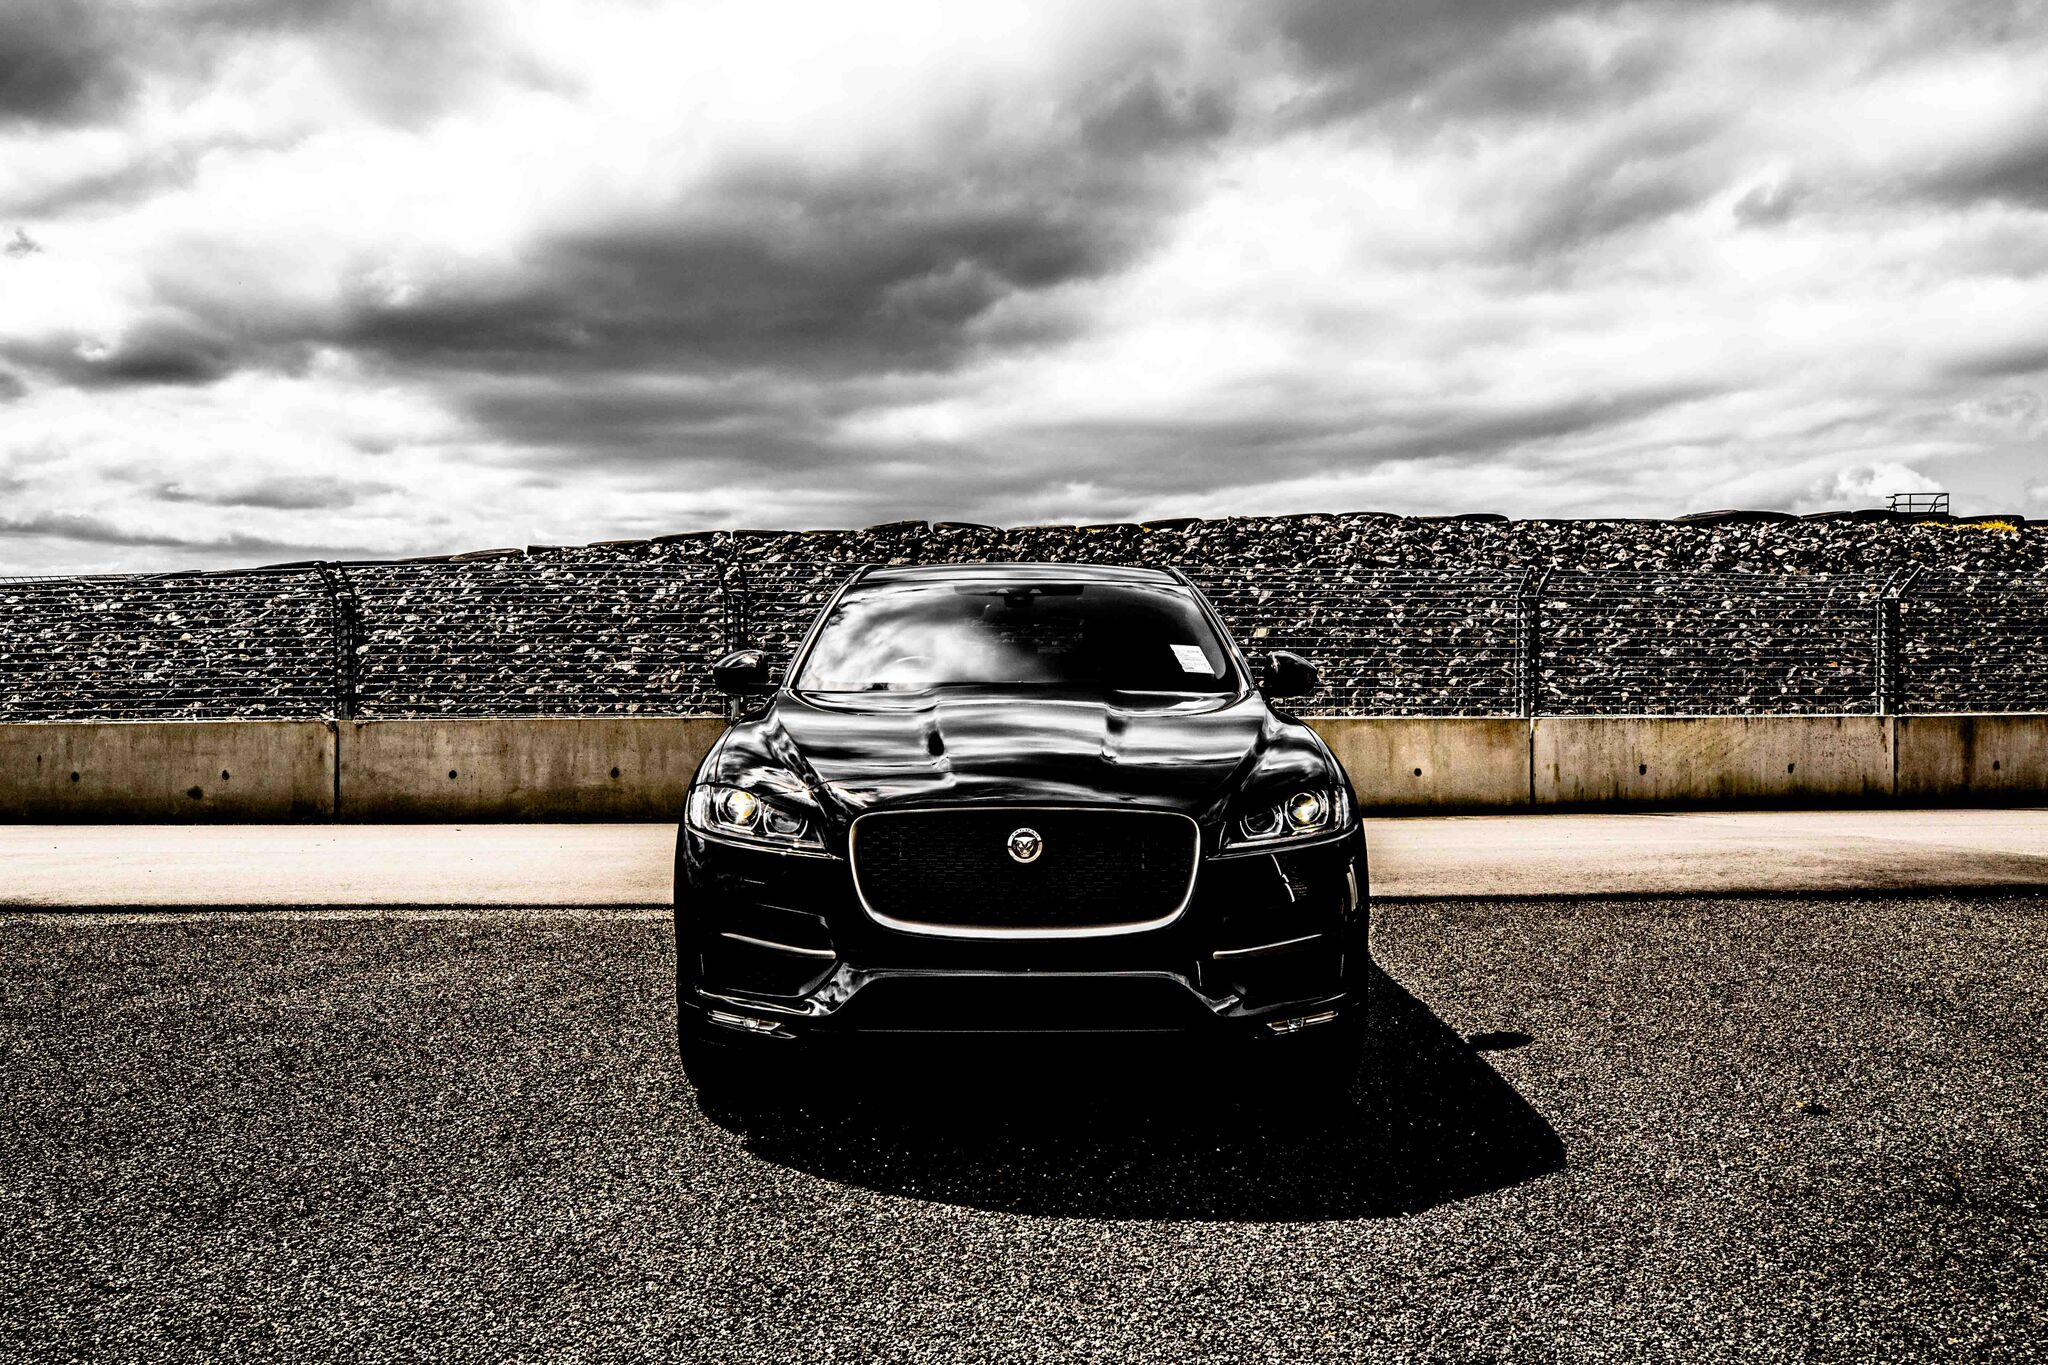 Jaguar - Art of Performance - WED AFTERNOON 2MB-149_preview.jpeg